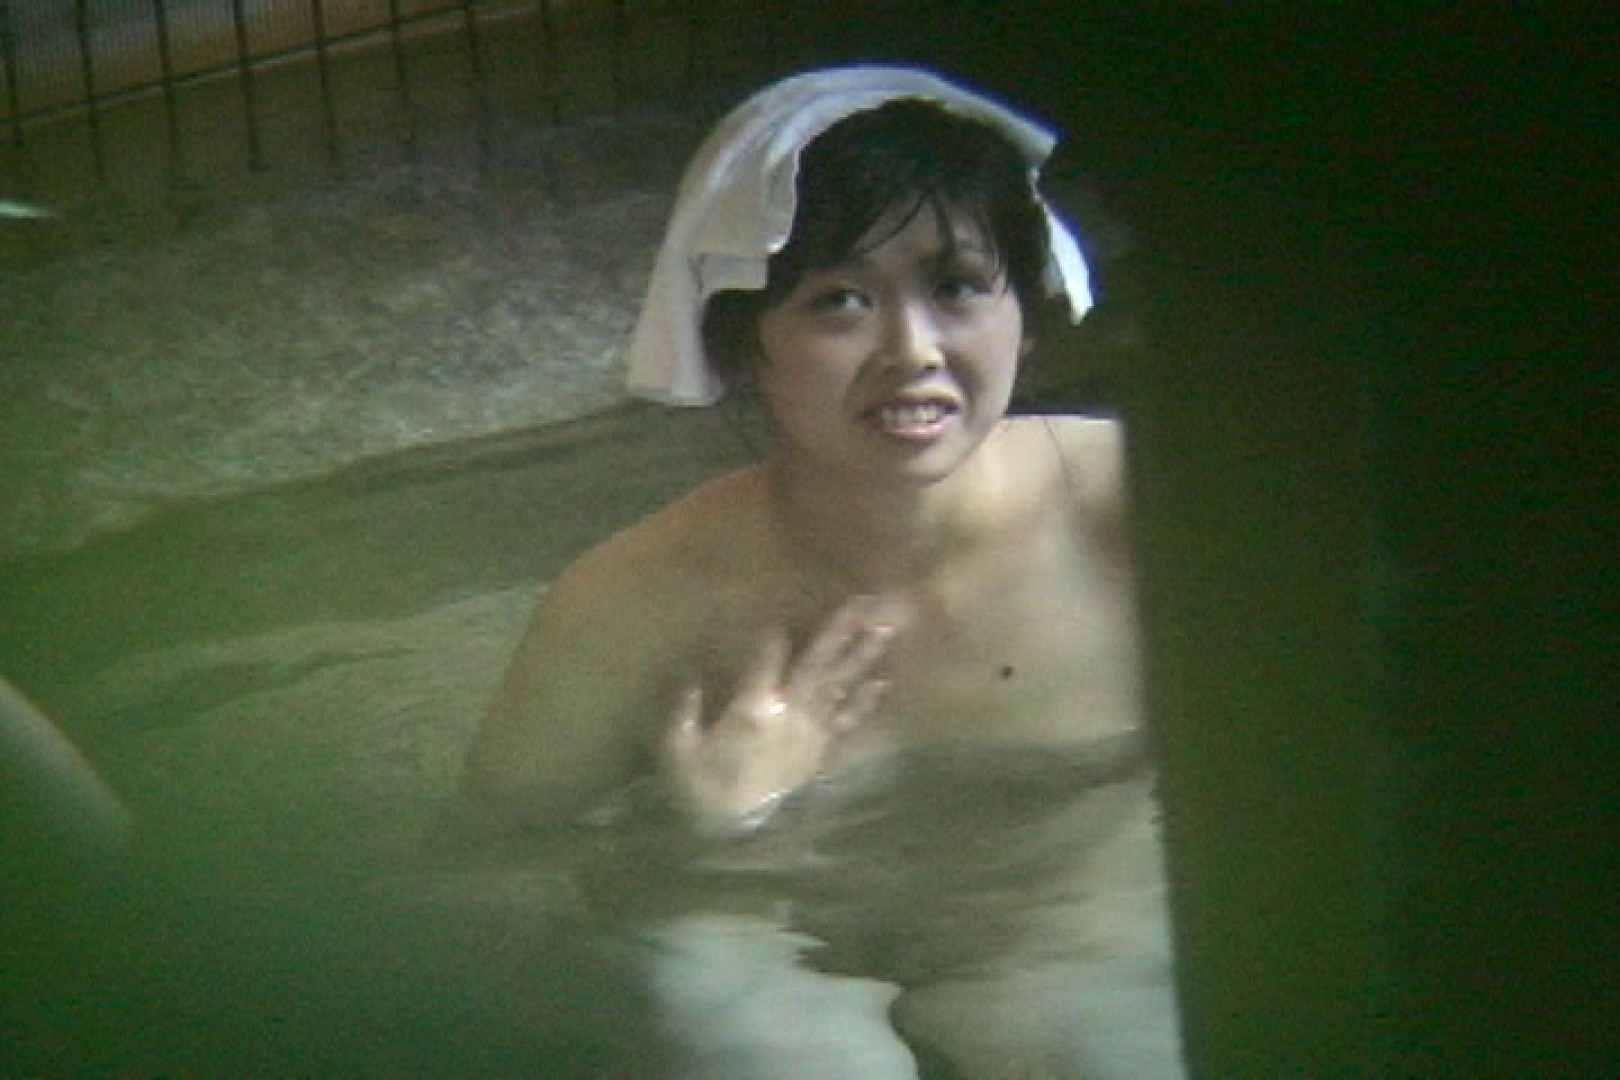 Aquaな露天風呂Vol.701 露天 すけべAV動画紹介 89連発 74